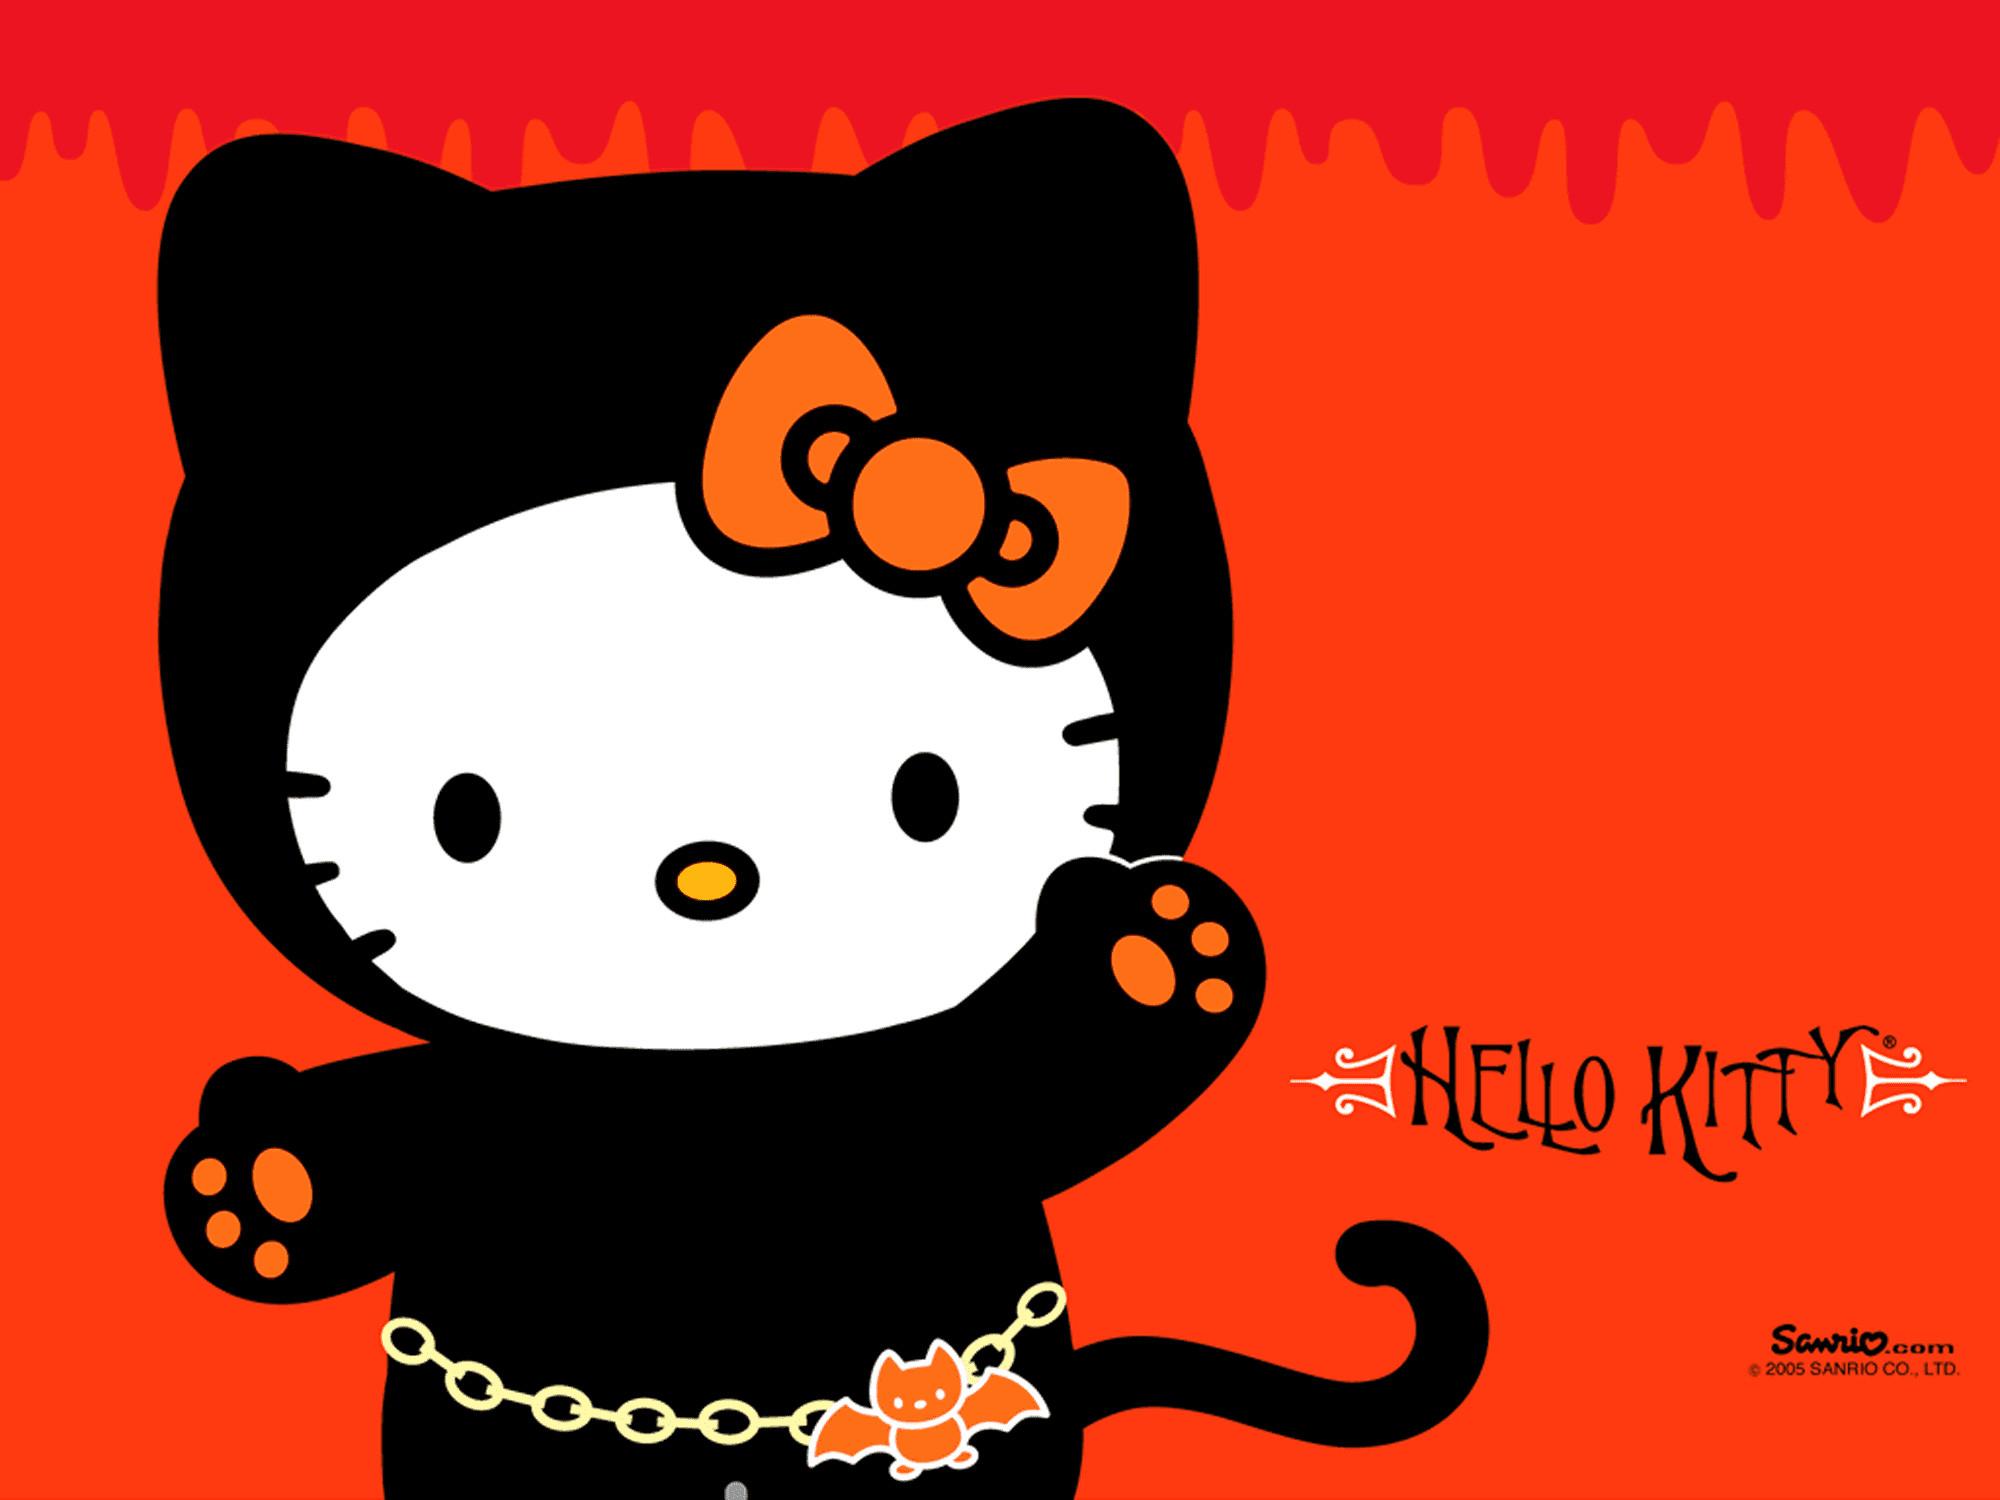 Wonderful Wallpaper Hello Kitty Vintage - 968549-cool-hello-kitty-wallpaper-pictures-2000x1500  Perfect Image Reference_23787.jpg